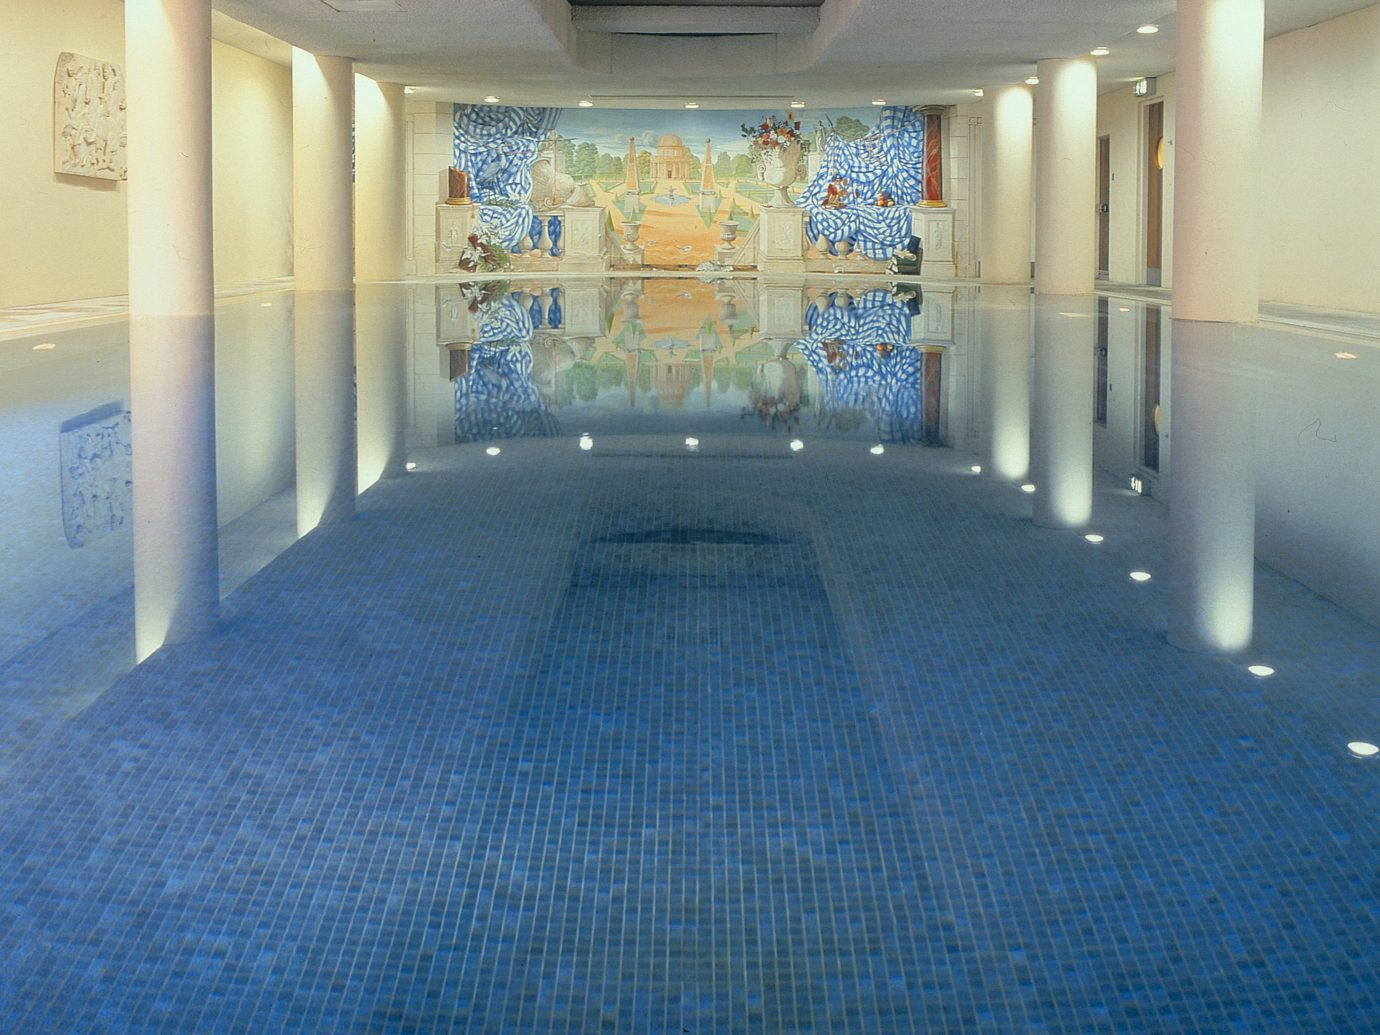 Dublin Hotels Ireland indoor floor property flooring leisure centre ceiling tile real estate interior design carpet daylighting hall